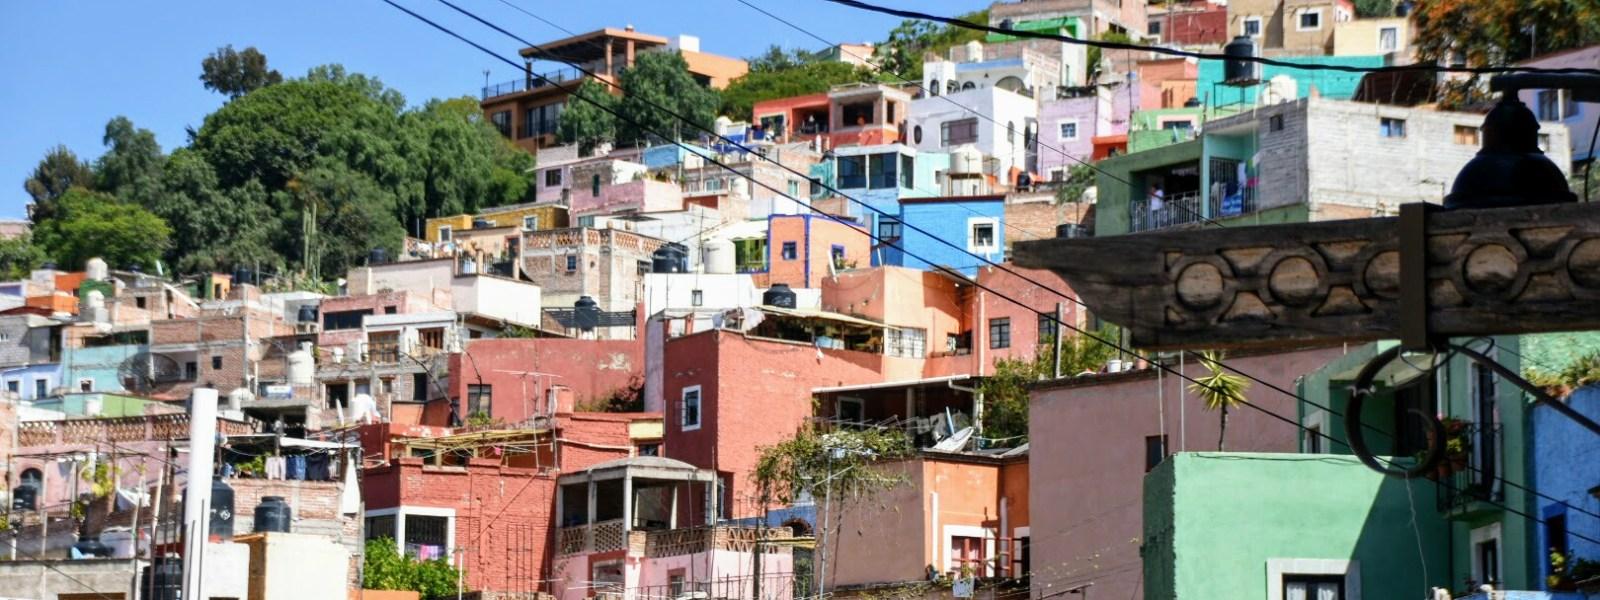 Guanajuato and San Miguel de Allende – México's Colourful Towns